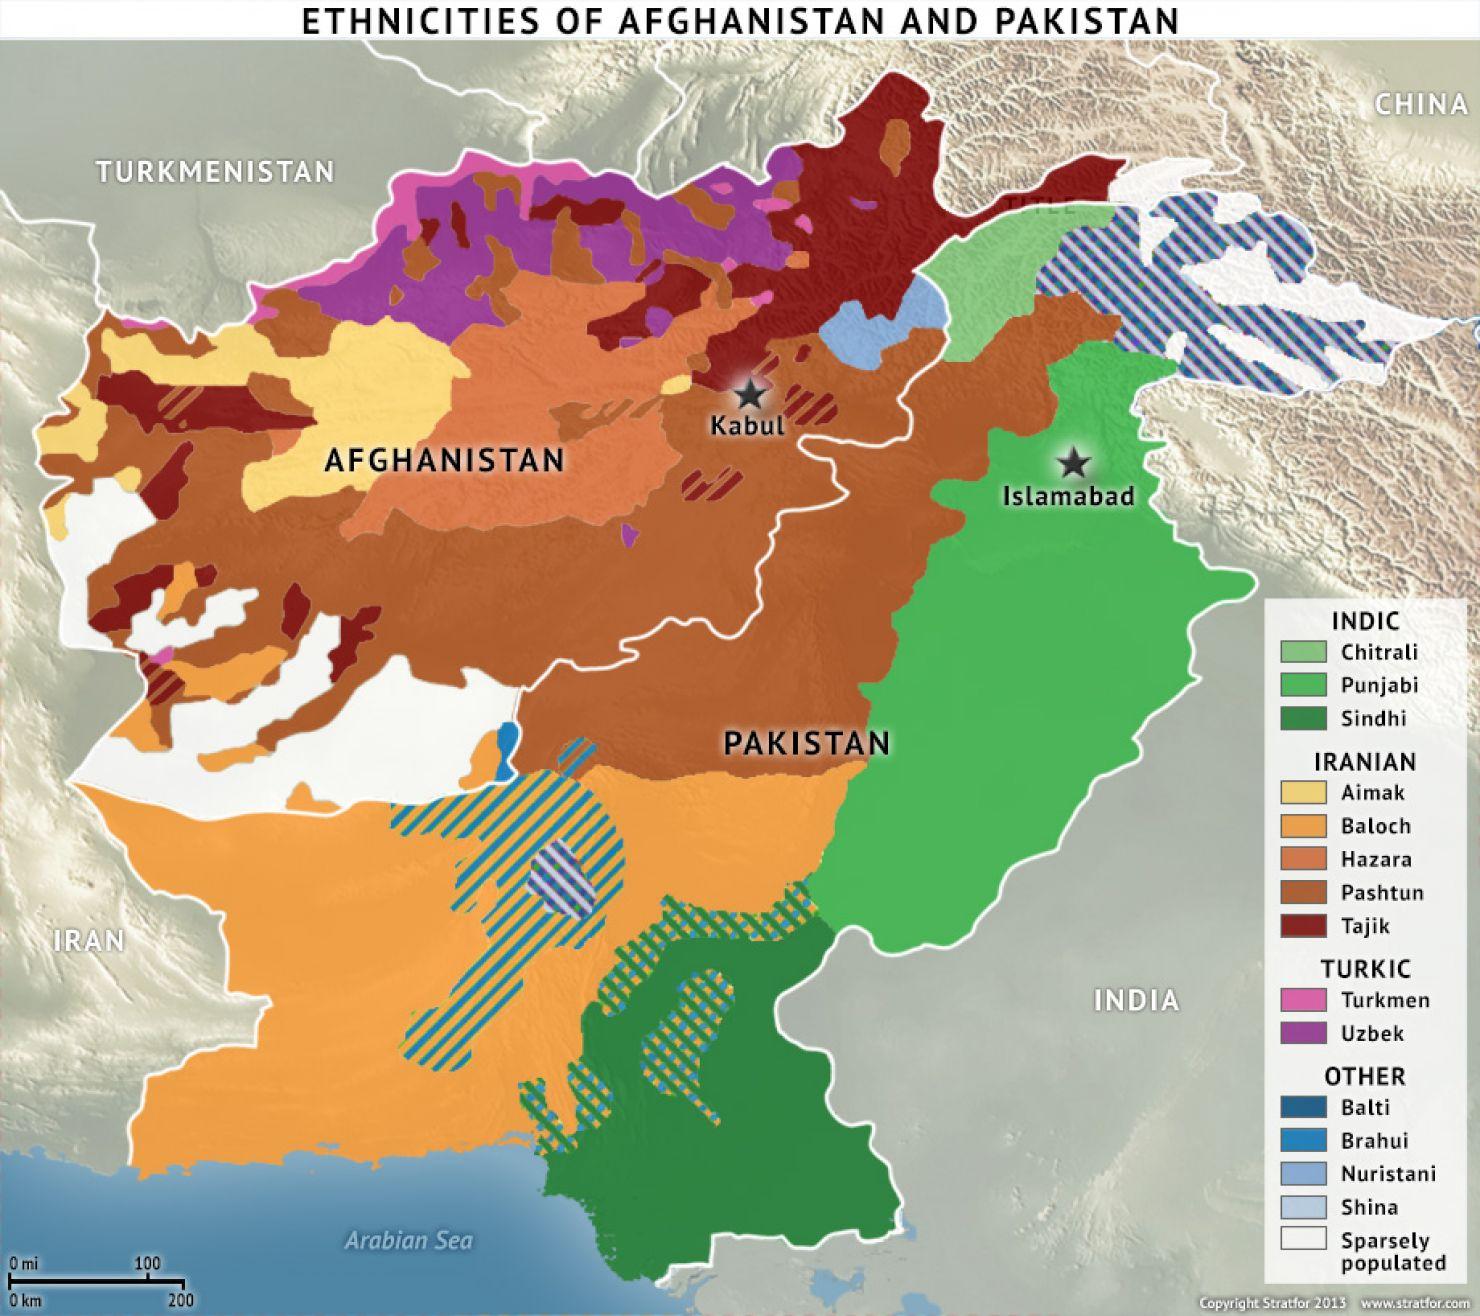 ethnicity in pakistan